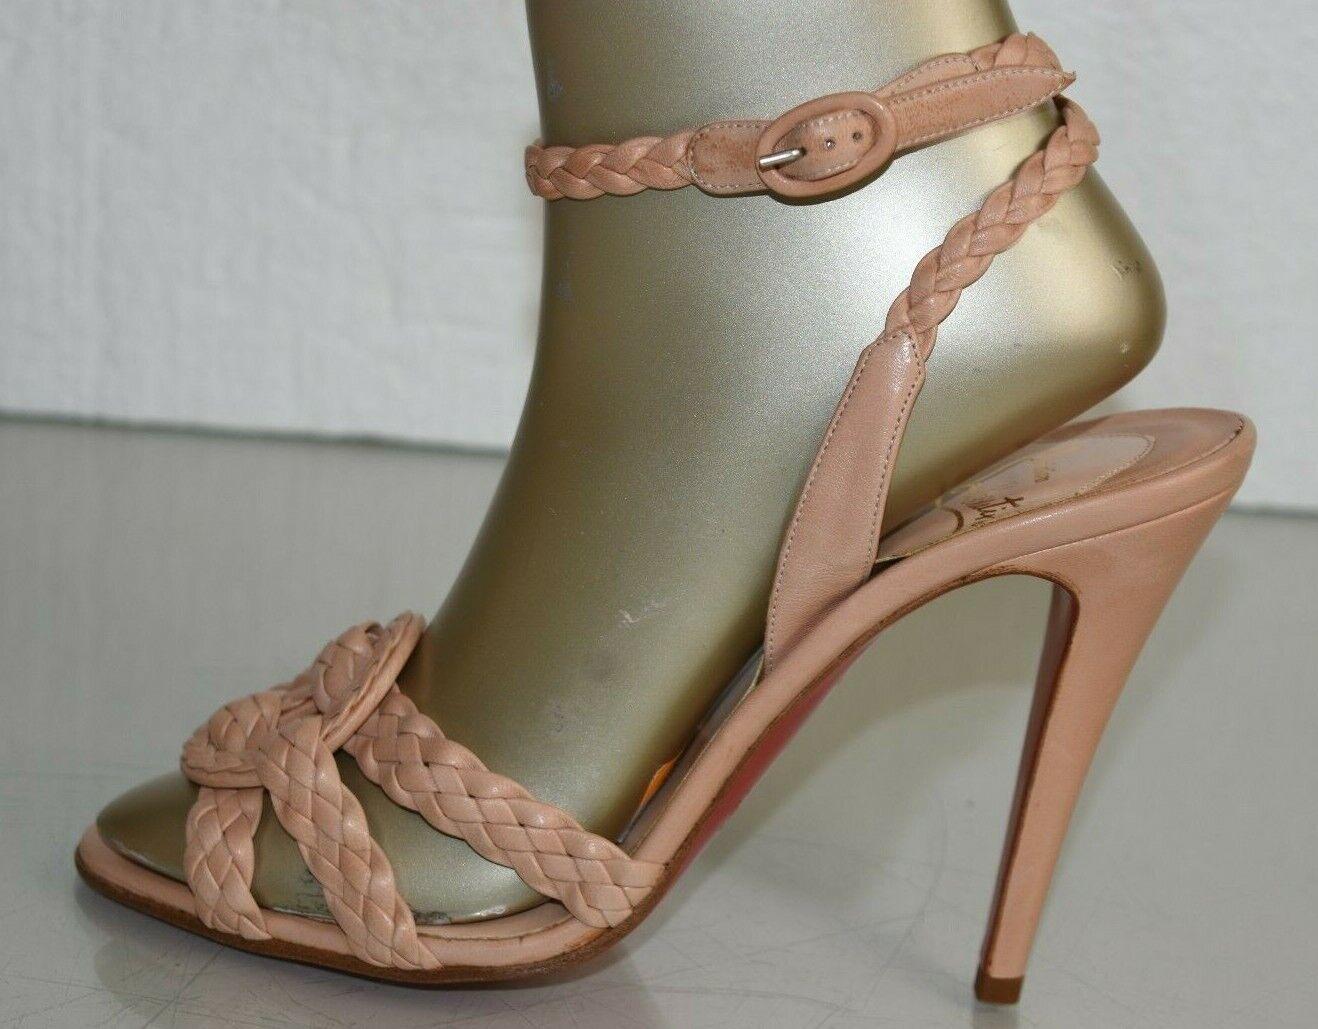 Neu Christian Louboutin Marilow Beige Gewebt Leder Sandalen Nude Schuhe 40.5 41